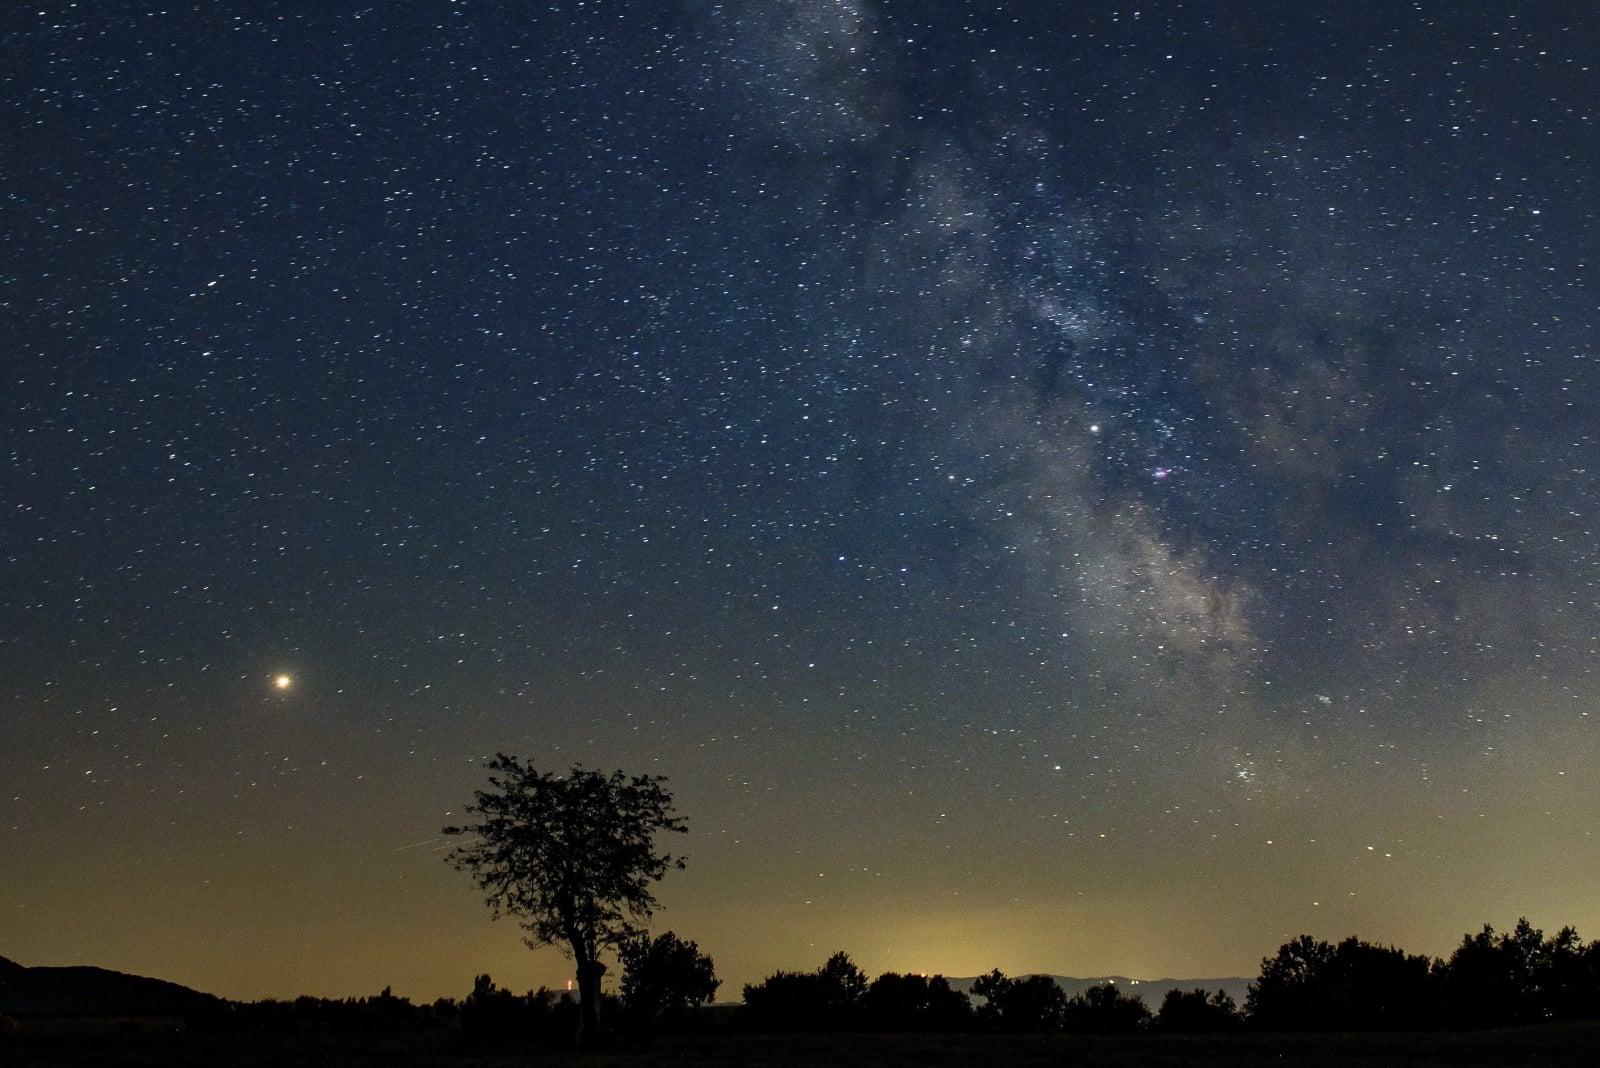 Mars i Droga Mleczna widziana w Salgotarjan, Węgry, fot. EPA/PETER KOMKA